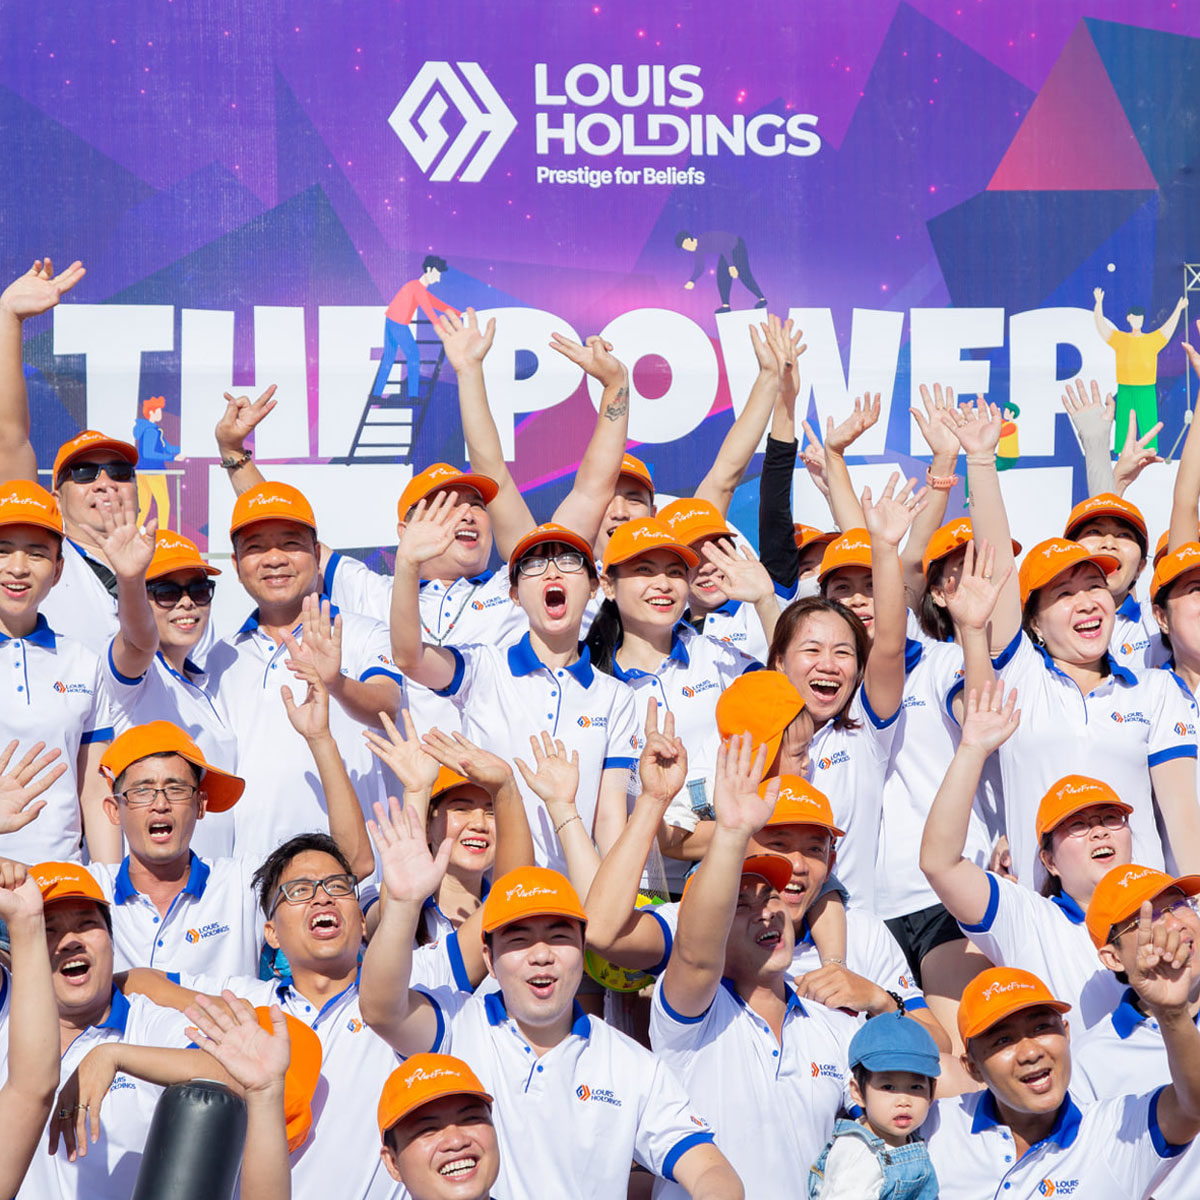 Louis Holdings